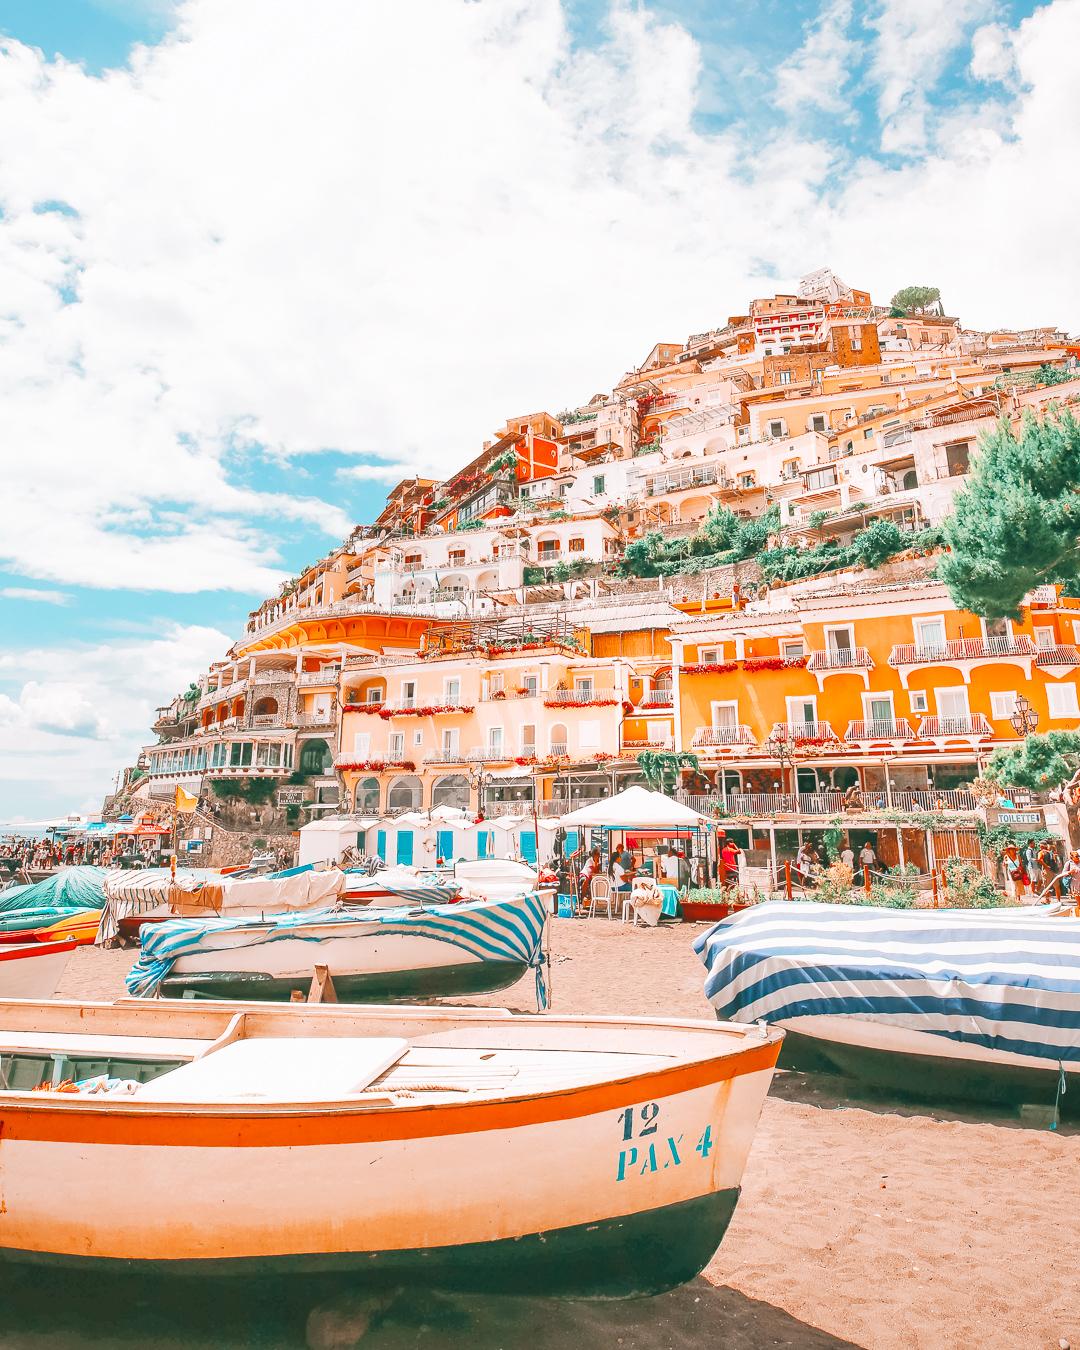 Boats on beach of Positano